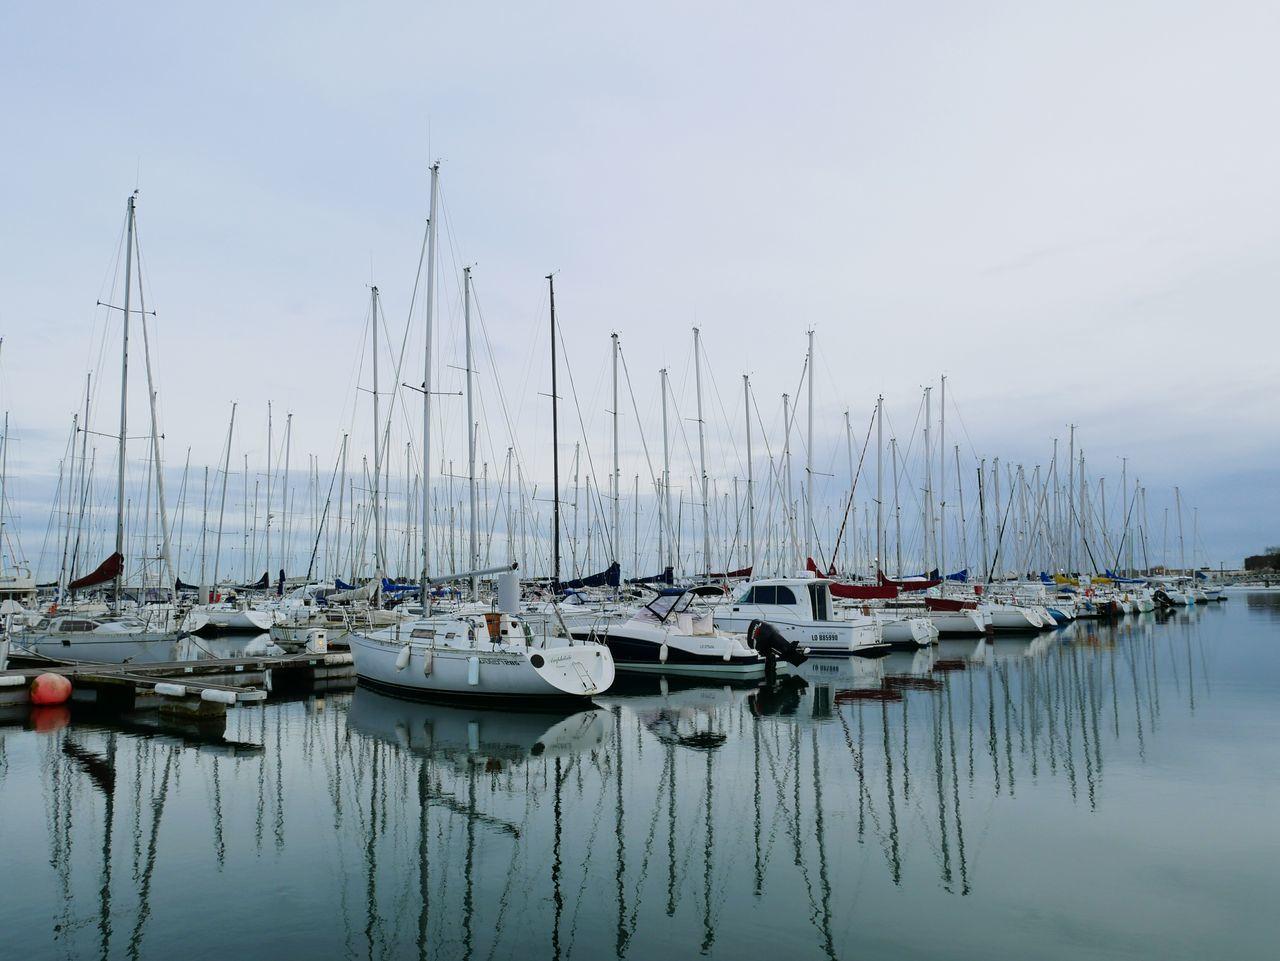 Reflection Nautical Vessel Mast Sky Water Outdoors Harbor Sea Sailboat Yacht⚓️ Yachting Marina Lorient